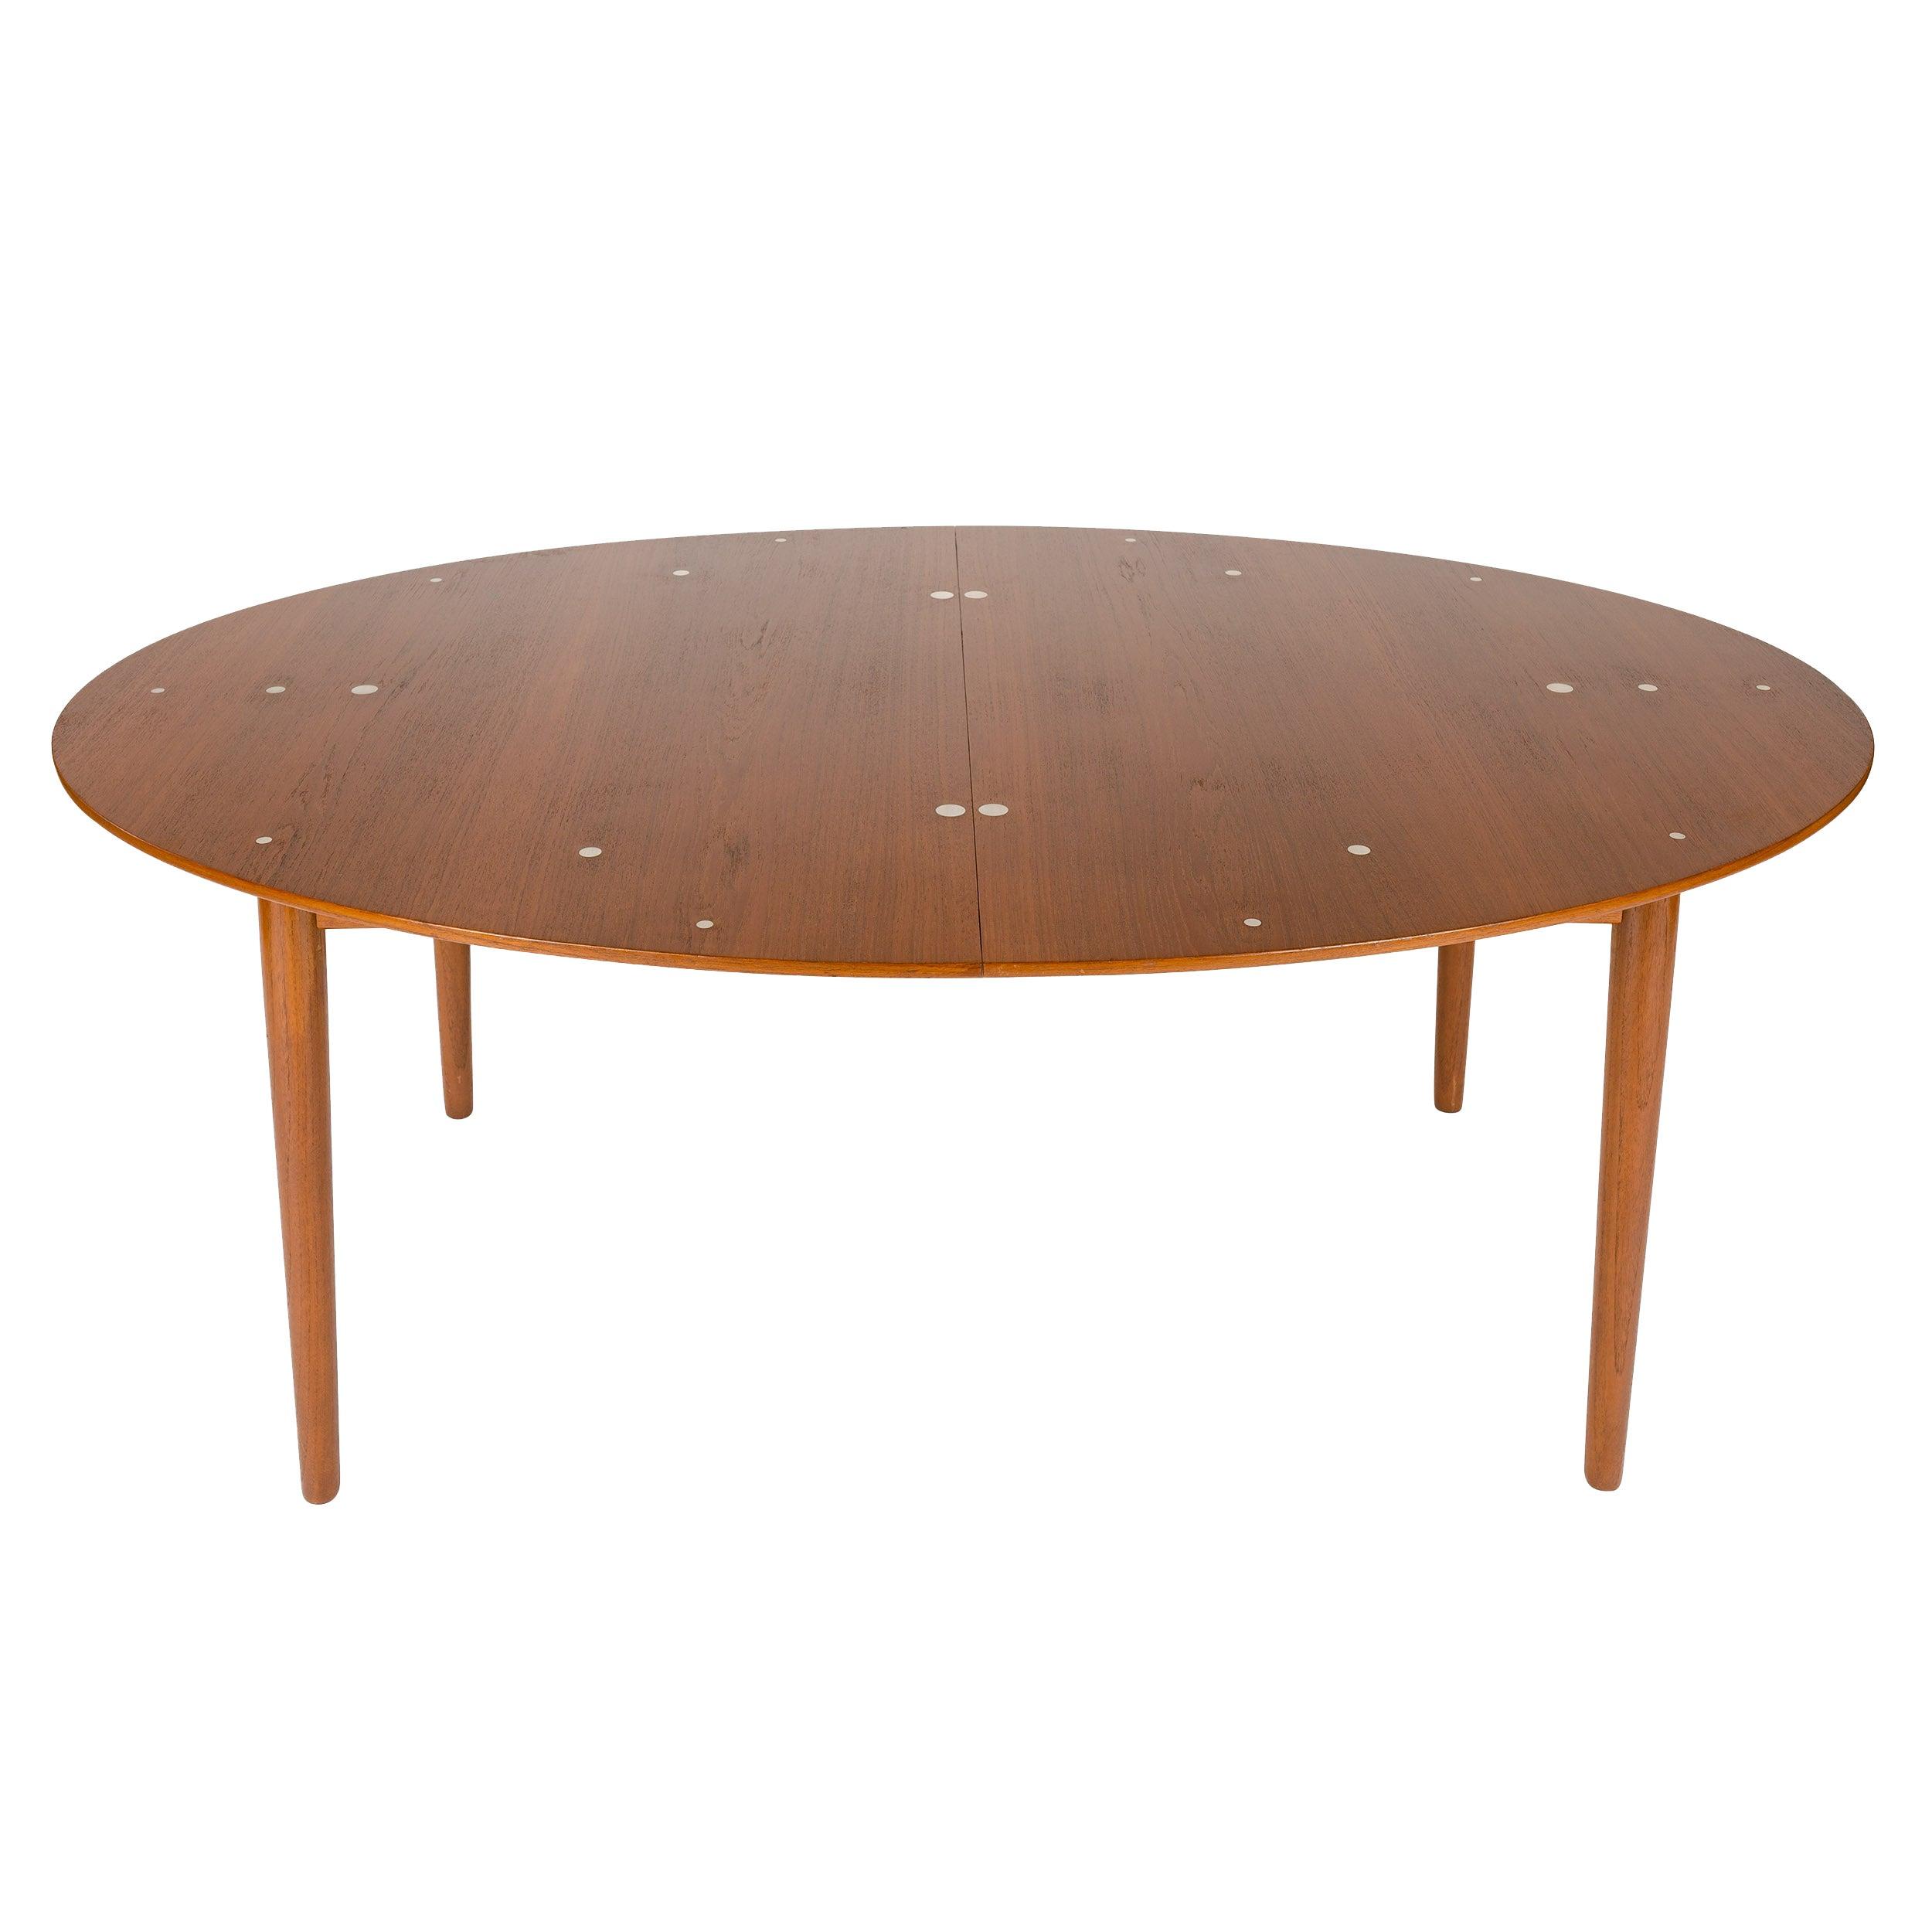 1950s Scandinavian Modern Judas Dining Table by Finn Juhl for Niels Vodder